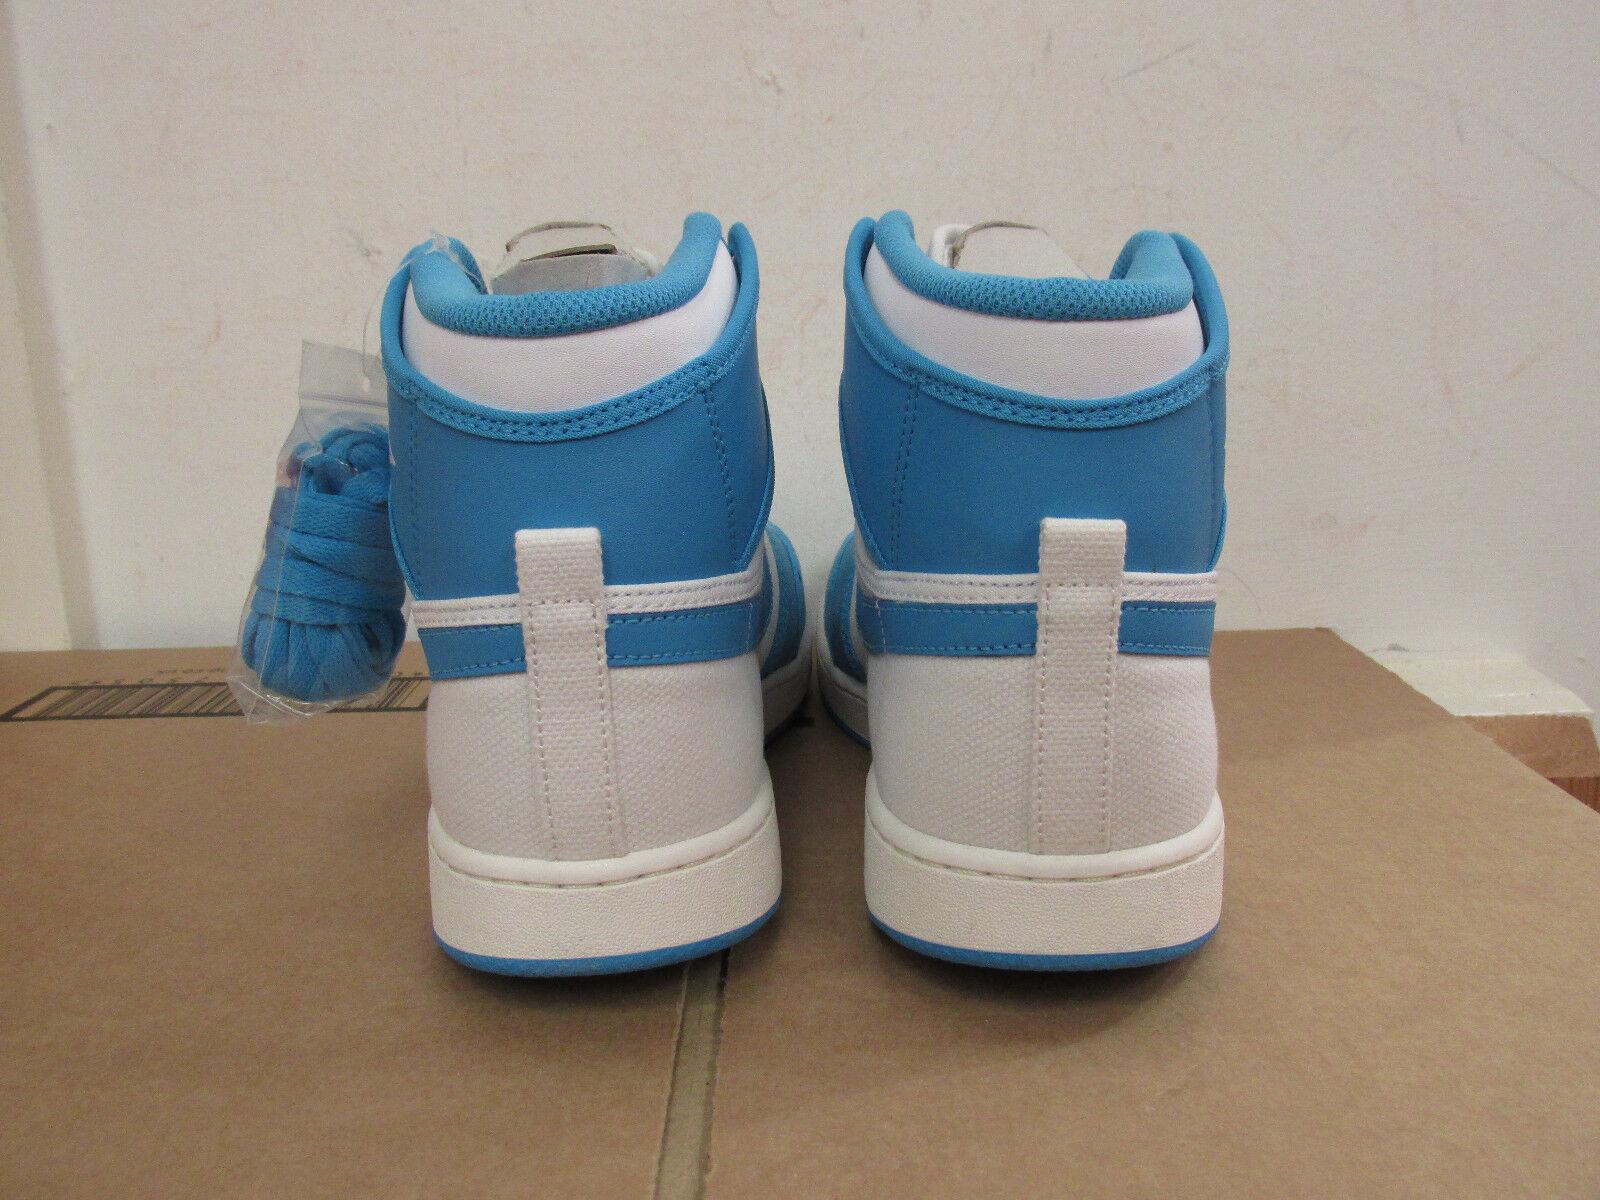 Nike jordan aj1 ko alto og rivale rivale rivale confezione uomo 655328 900 scarpe da 733b11